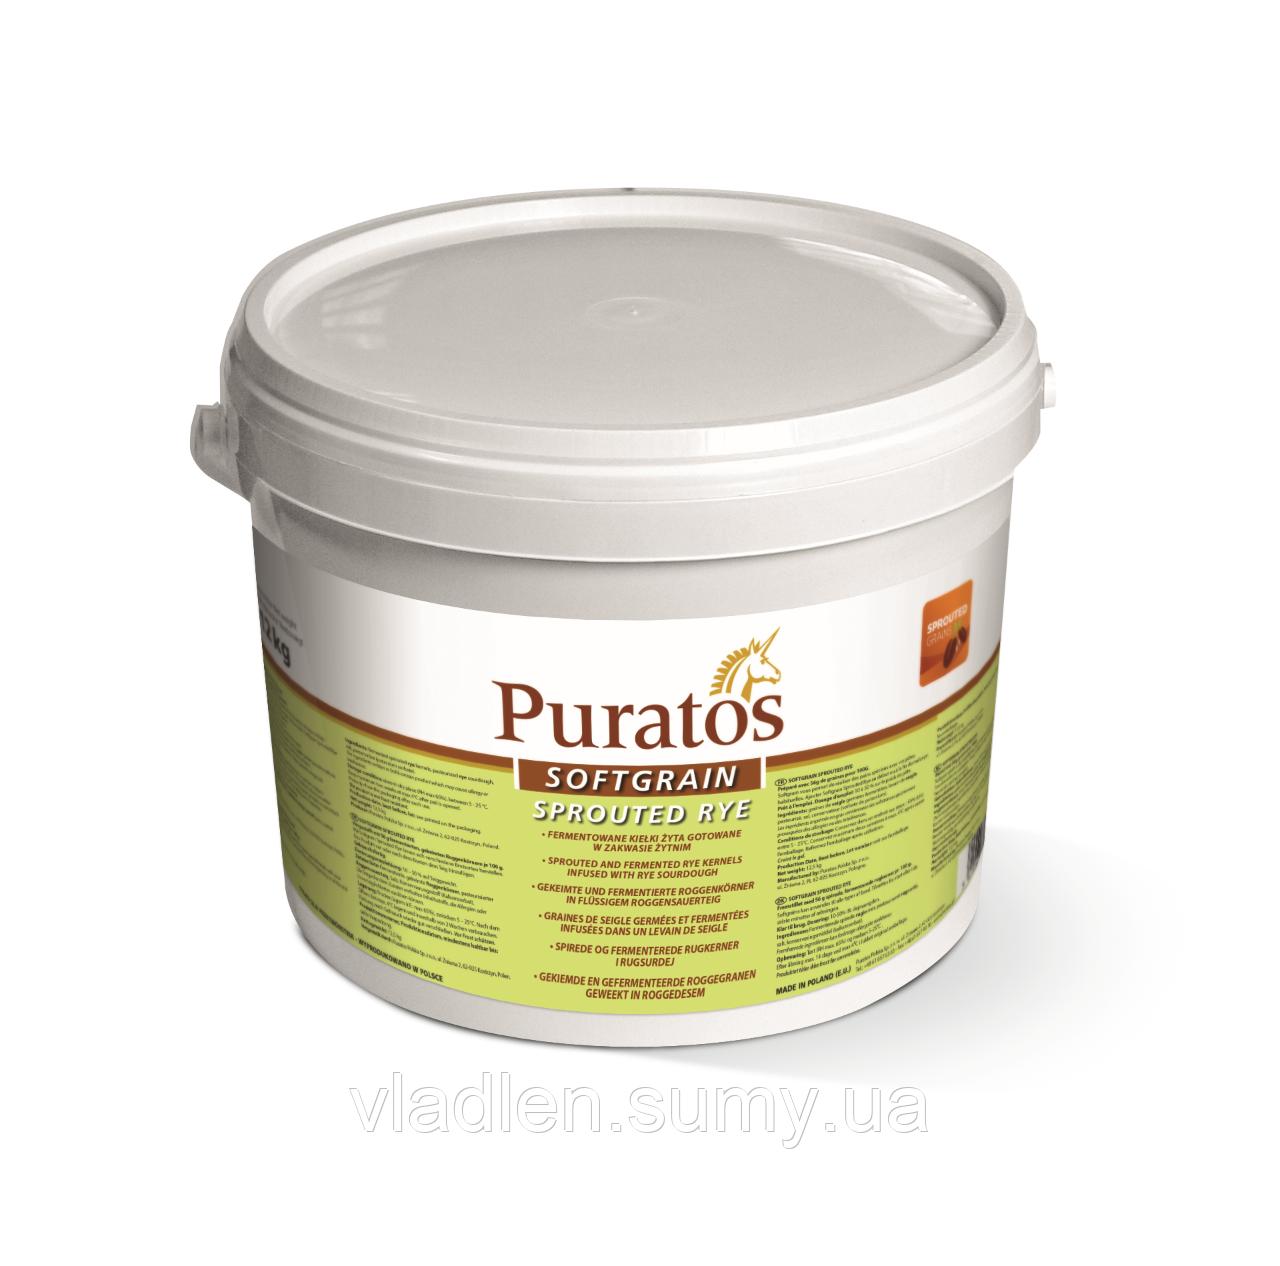 "Натуральна ароматна зернова закваска ""Пророщене жито"" (Softgrain Sprouted Rye) Puratos 12 кг"